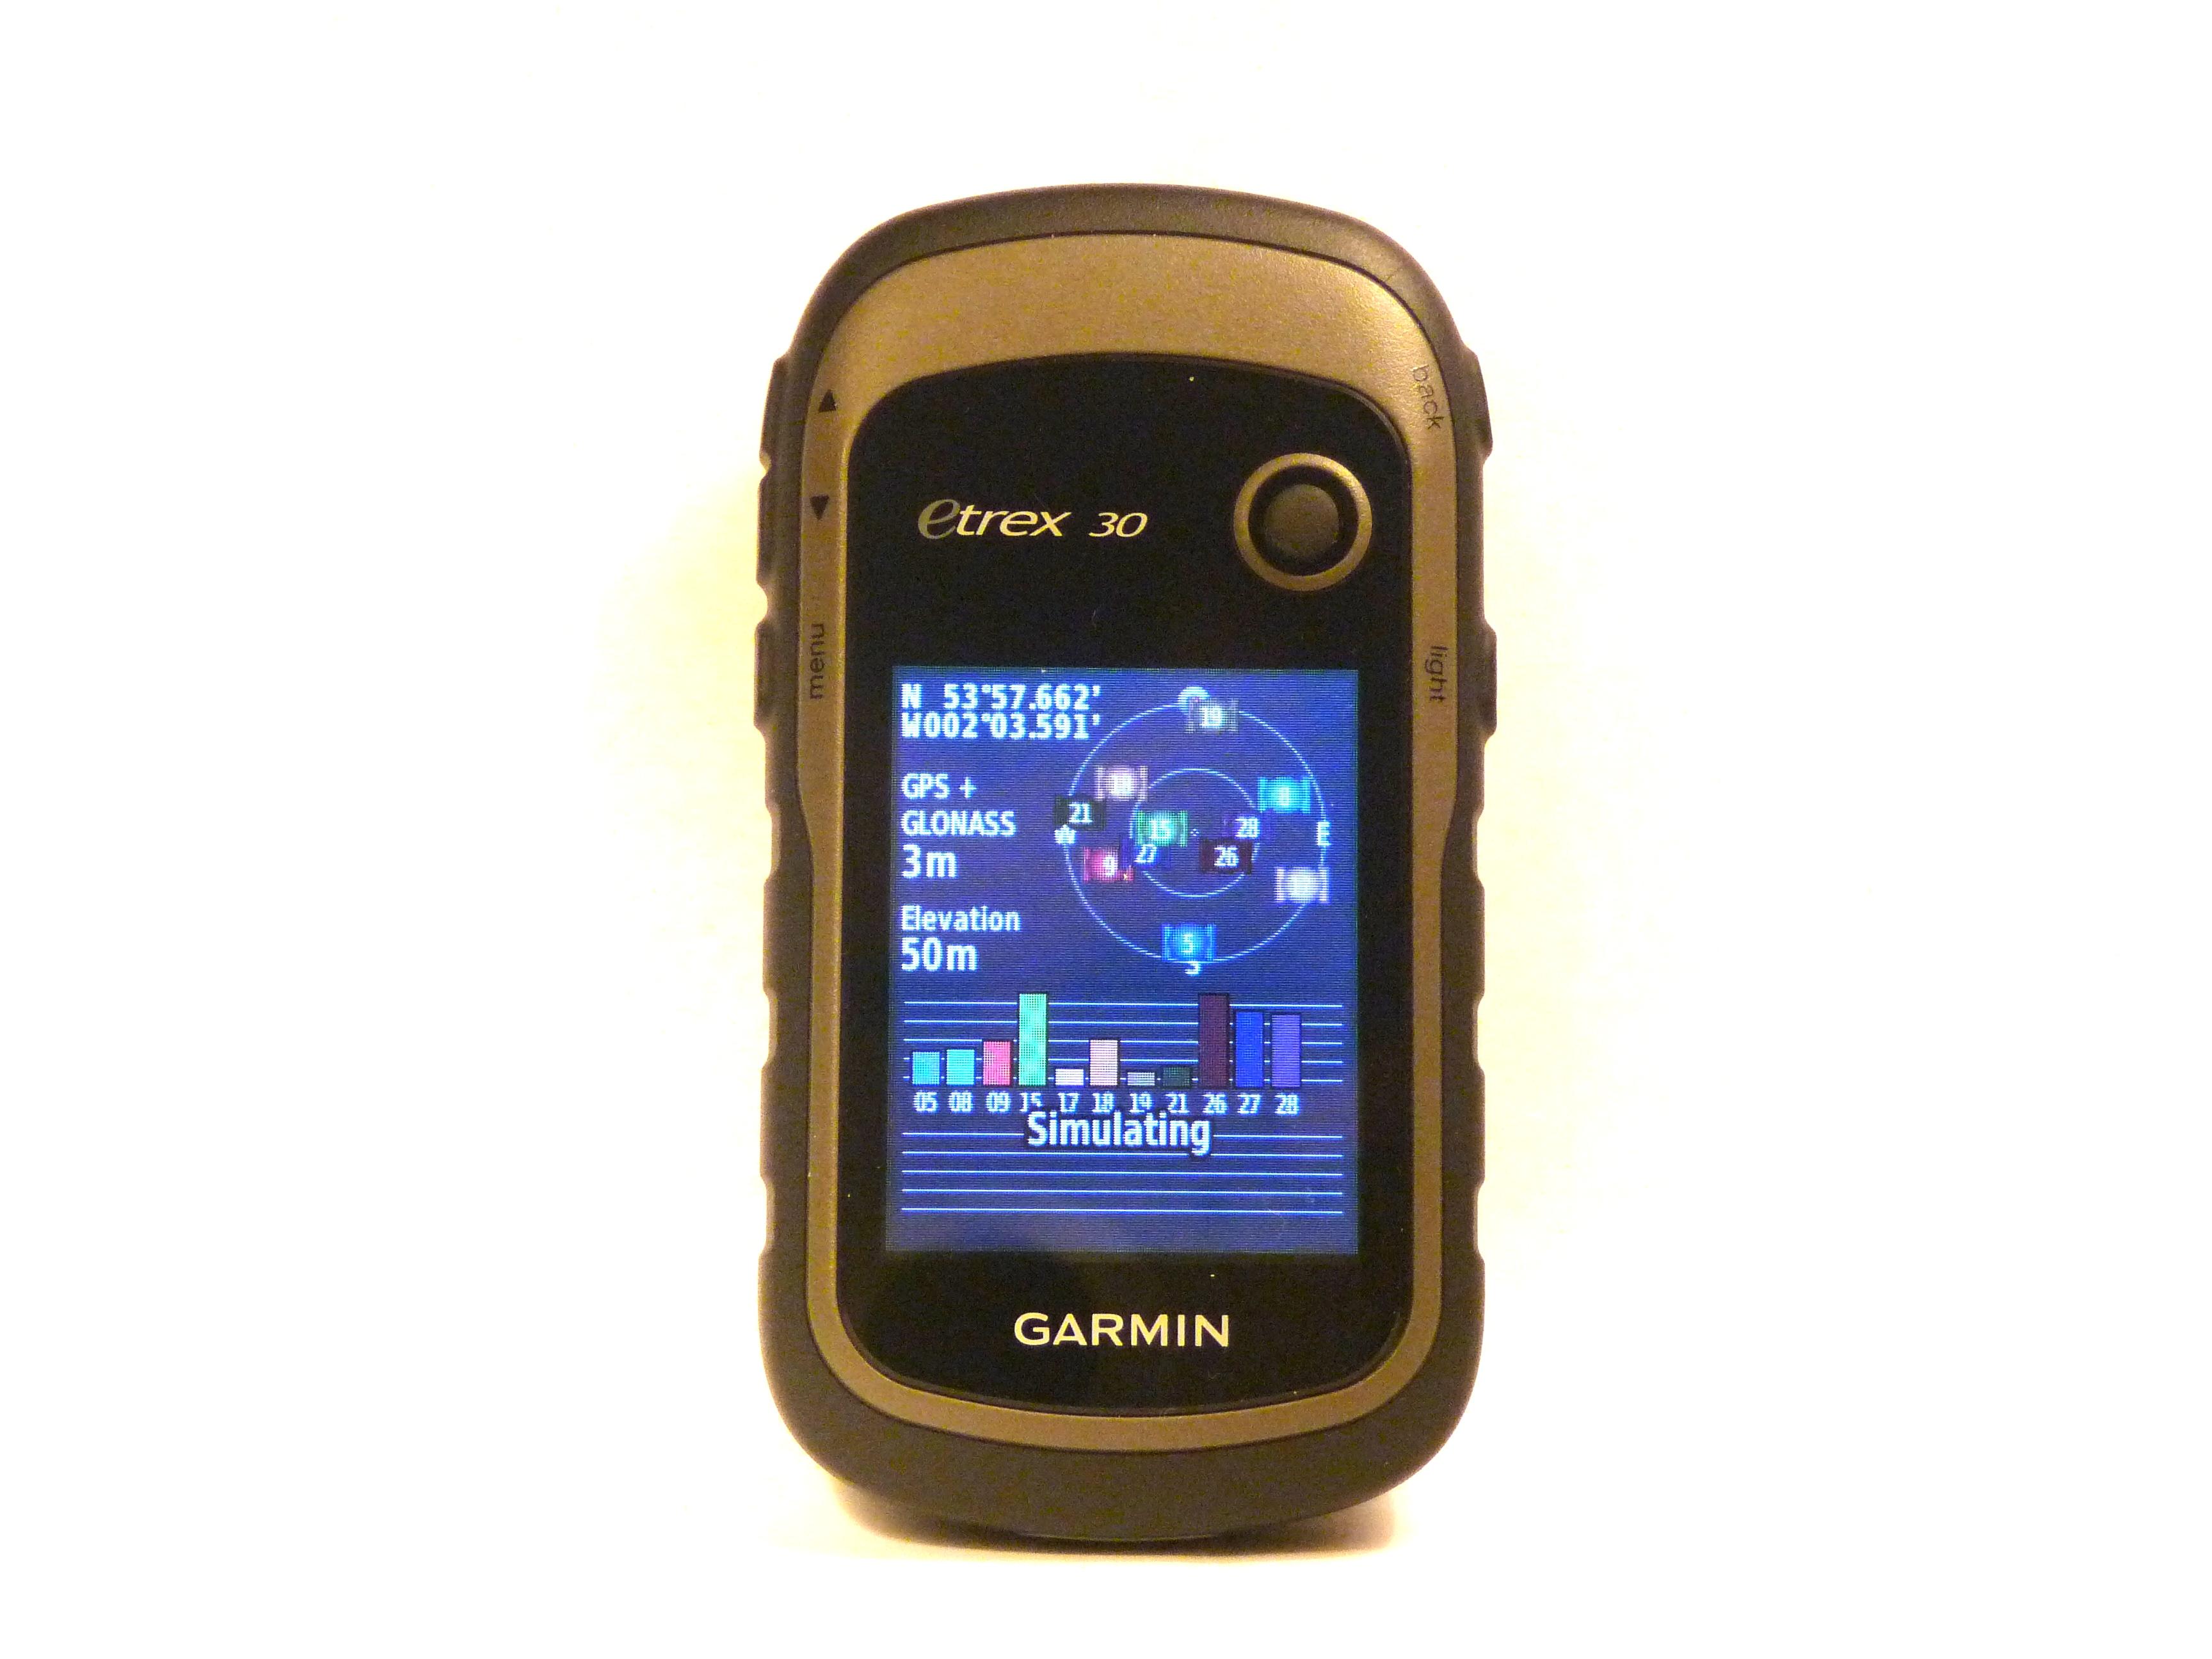 File:Garmin eTrex 30.JPG